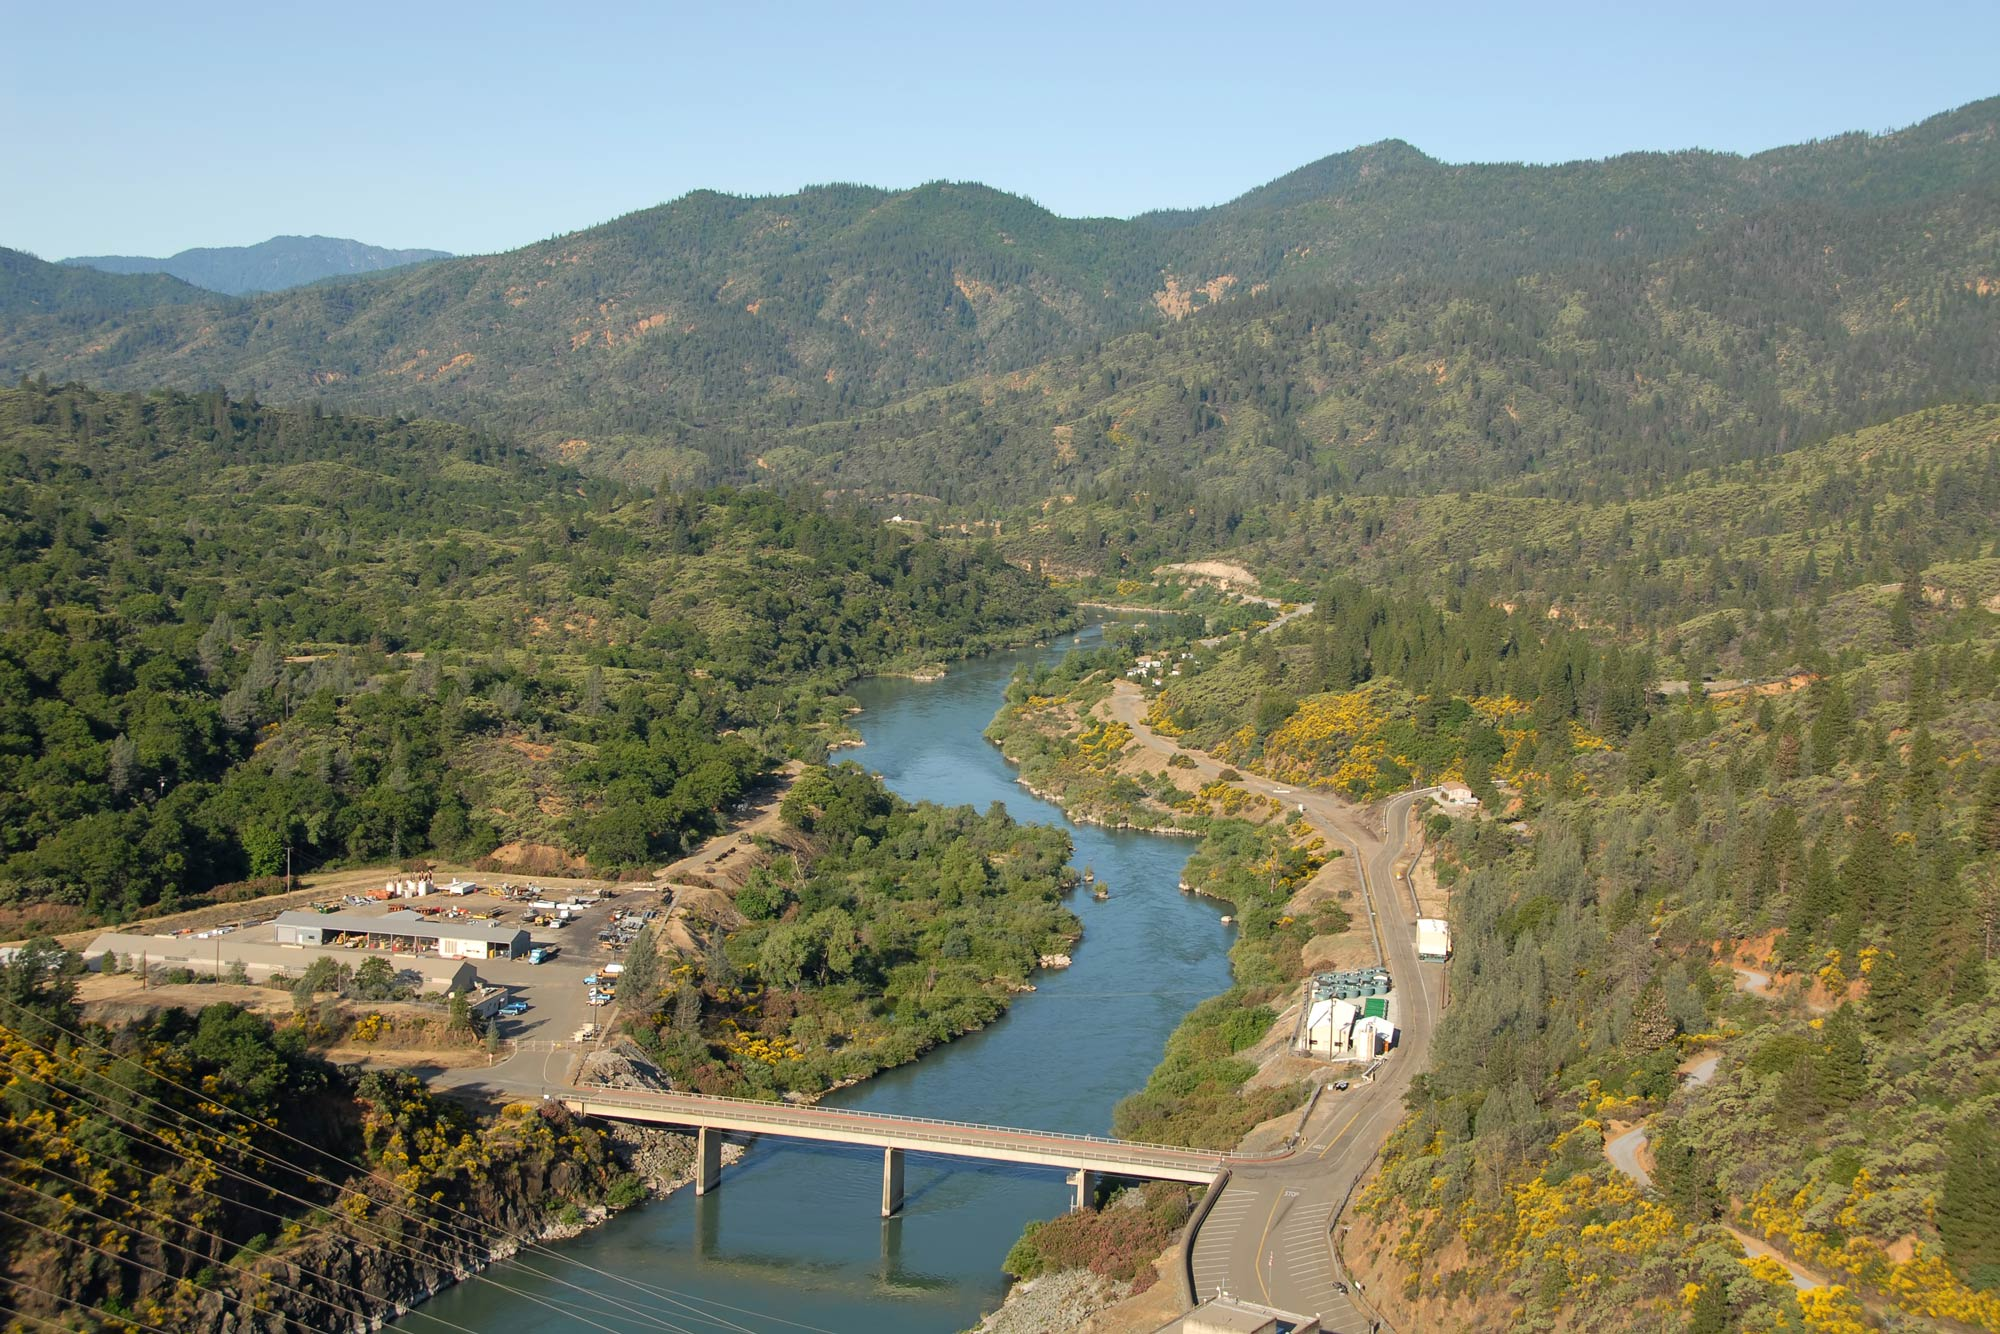 An aerial view of the Upper Sacramento River